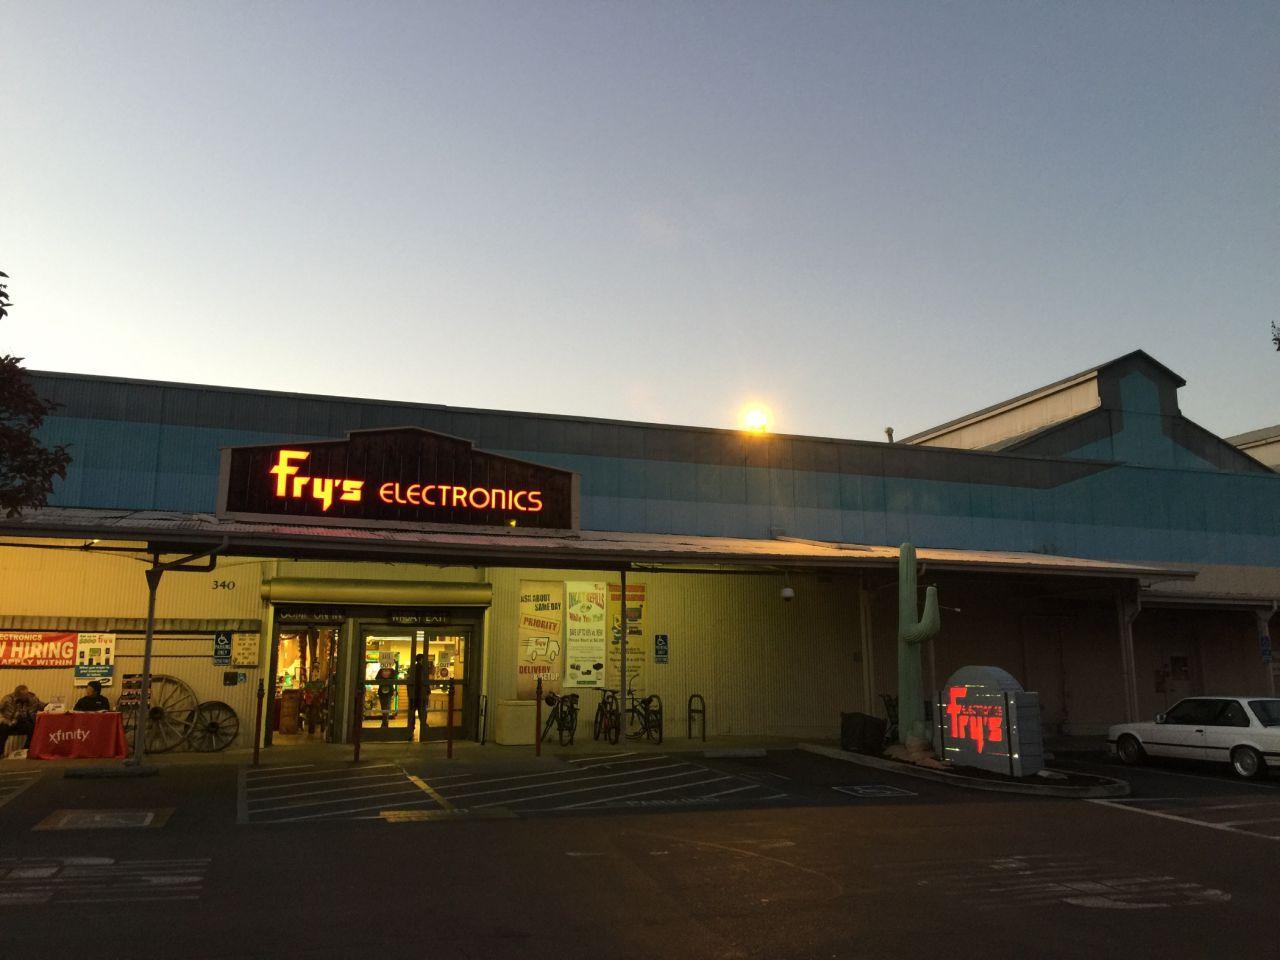 Fry's Electronics Palo Alto Nighttime